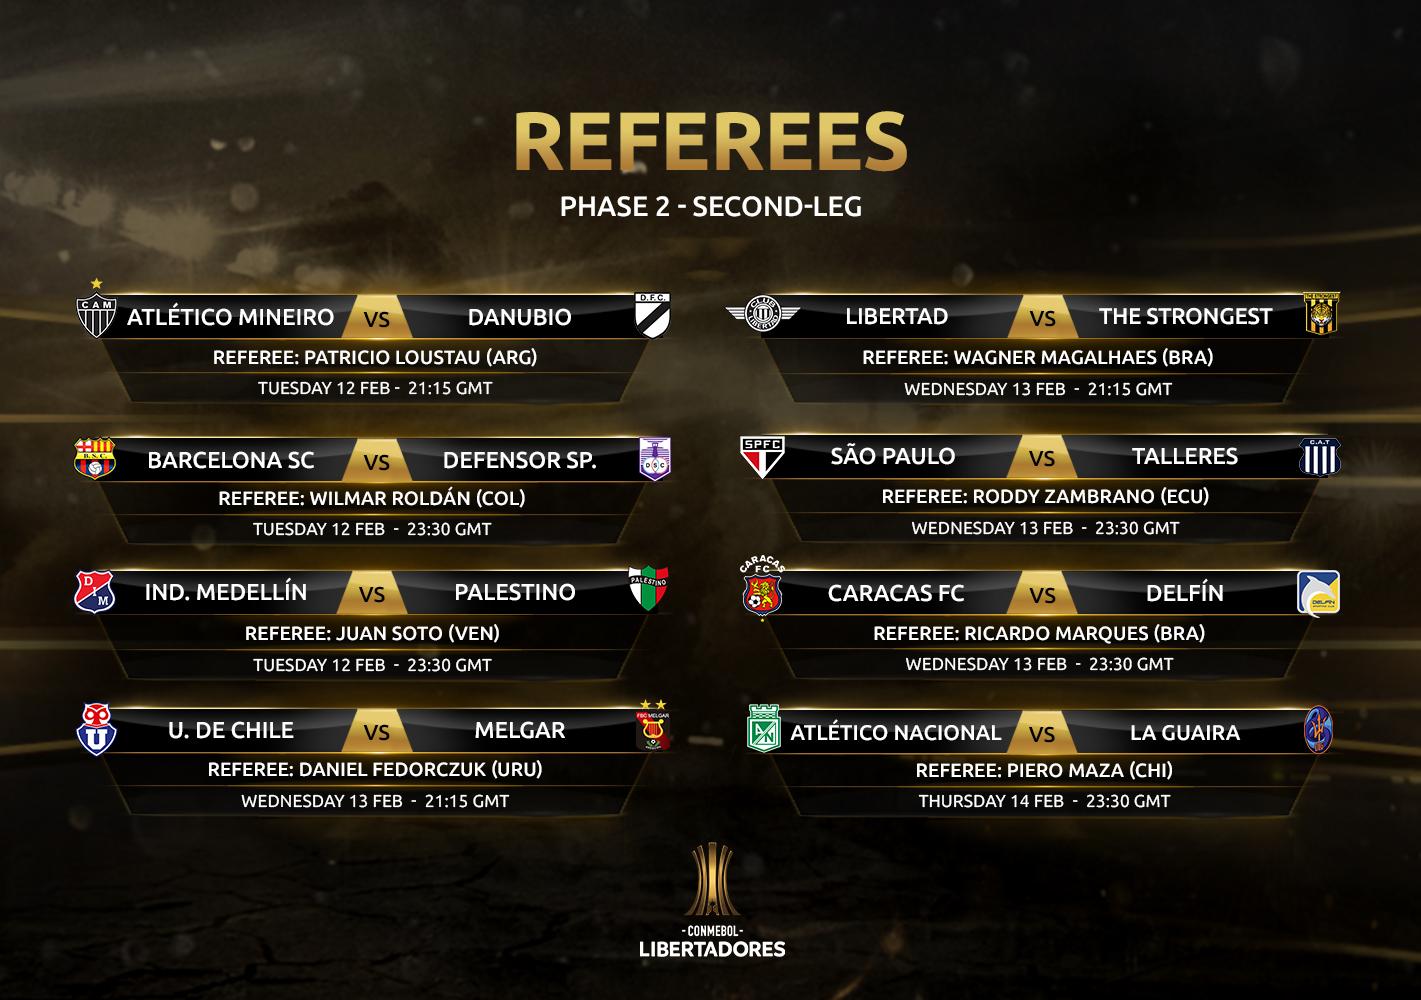 Referees 2nd leg, Phase 2